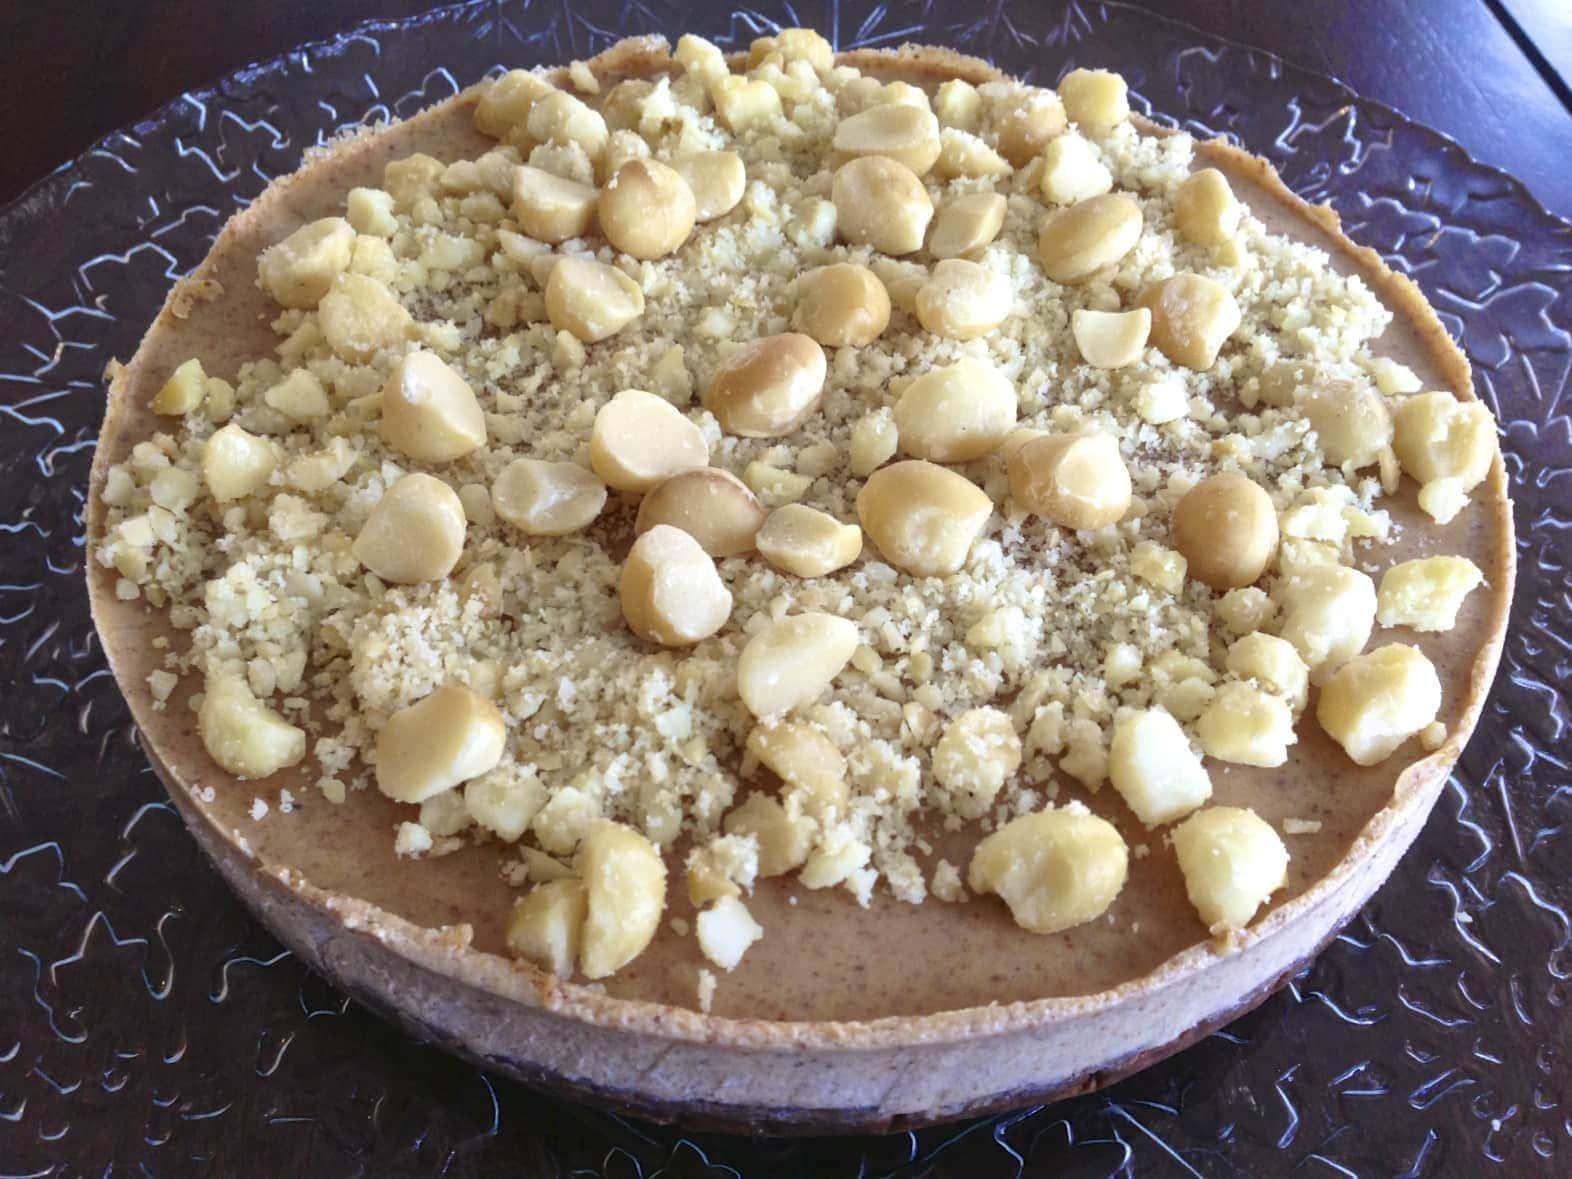 Paleo Macadamia Nut Pie